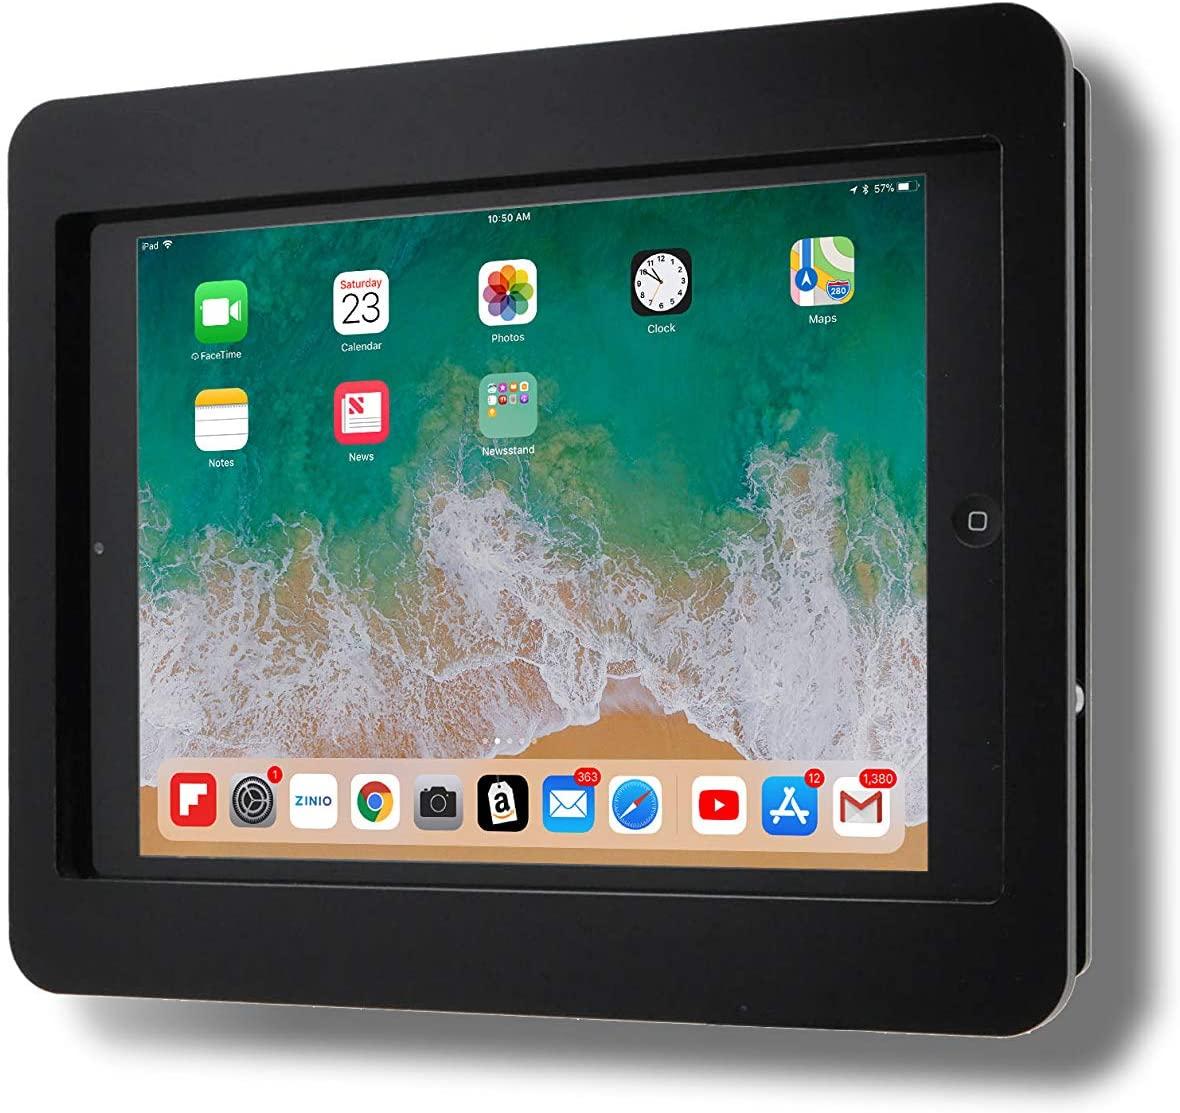 TABcare Anti-Theft Acrylic VESA Enclosure for Apple iPad Mini 4/5 with Free Wall Mount Kit & 90-Degree Angle Charge Cable (iPad Mini 4/5 8